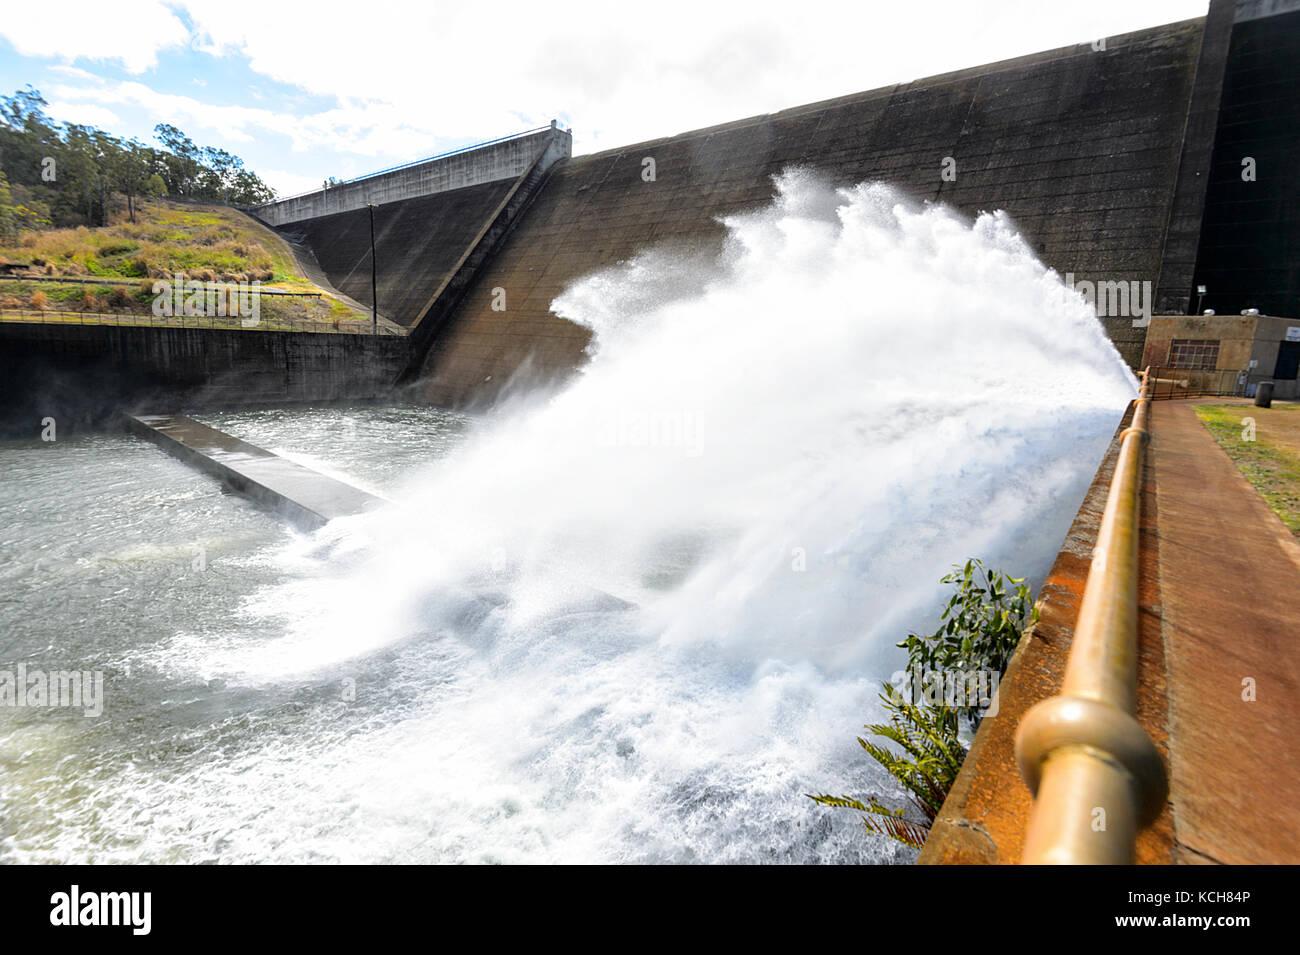 tinaroo-falls-dam-river-outlet-across-th